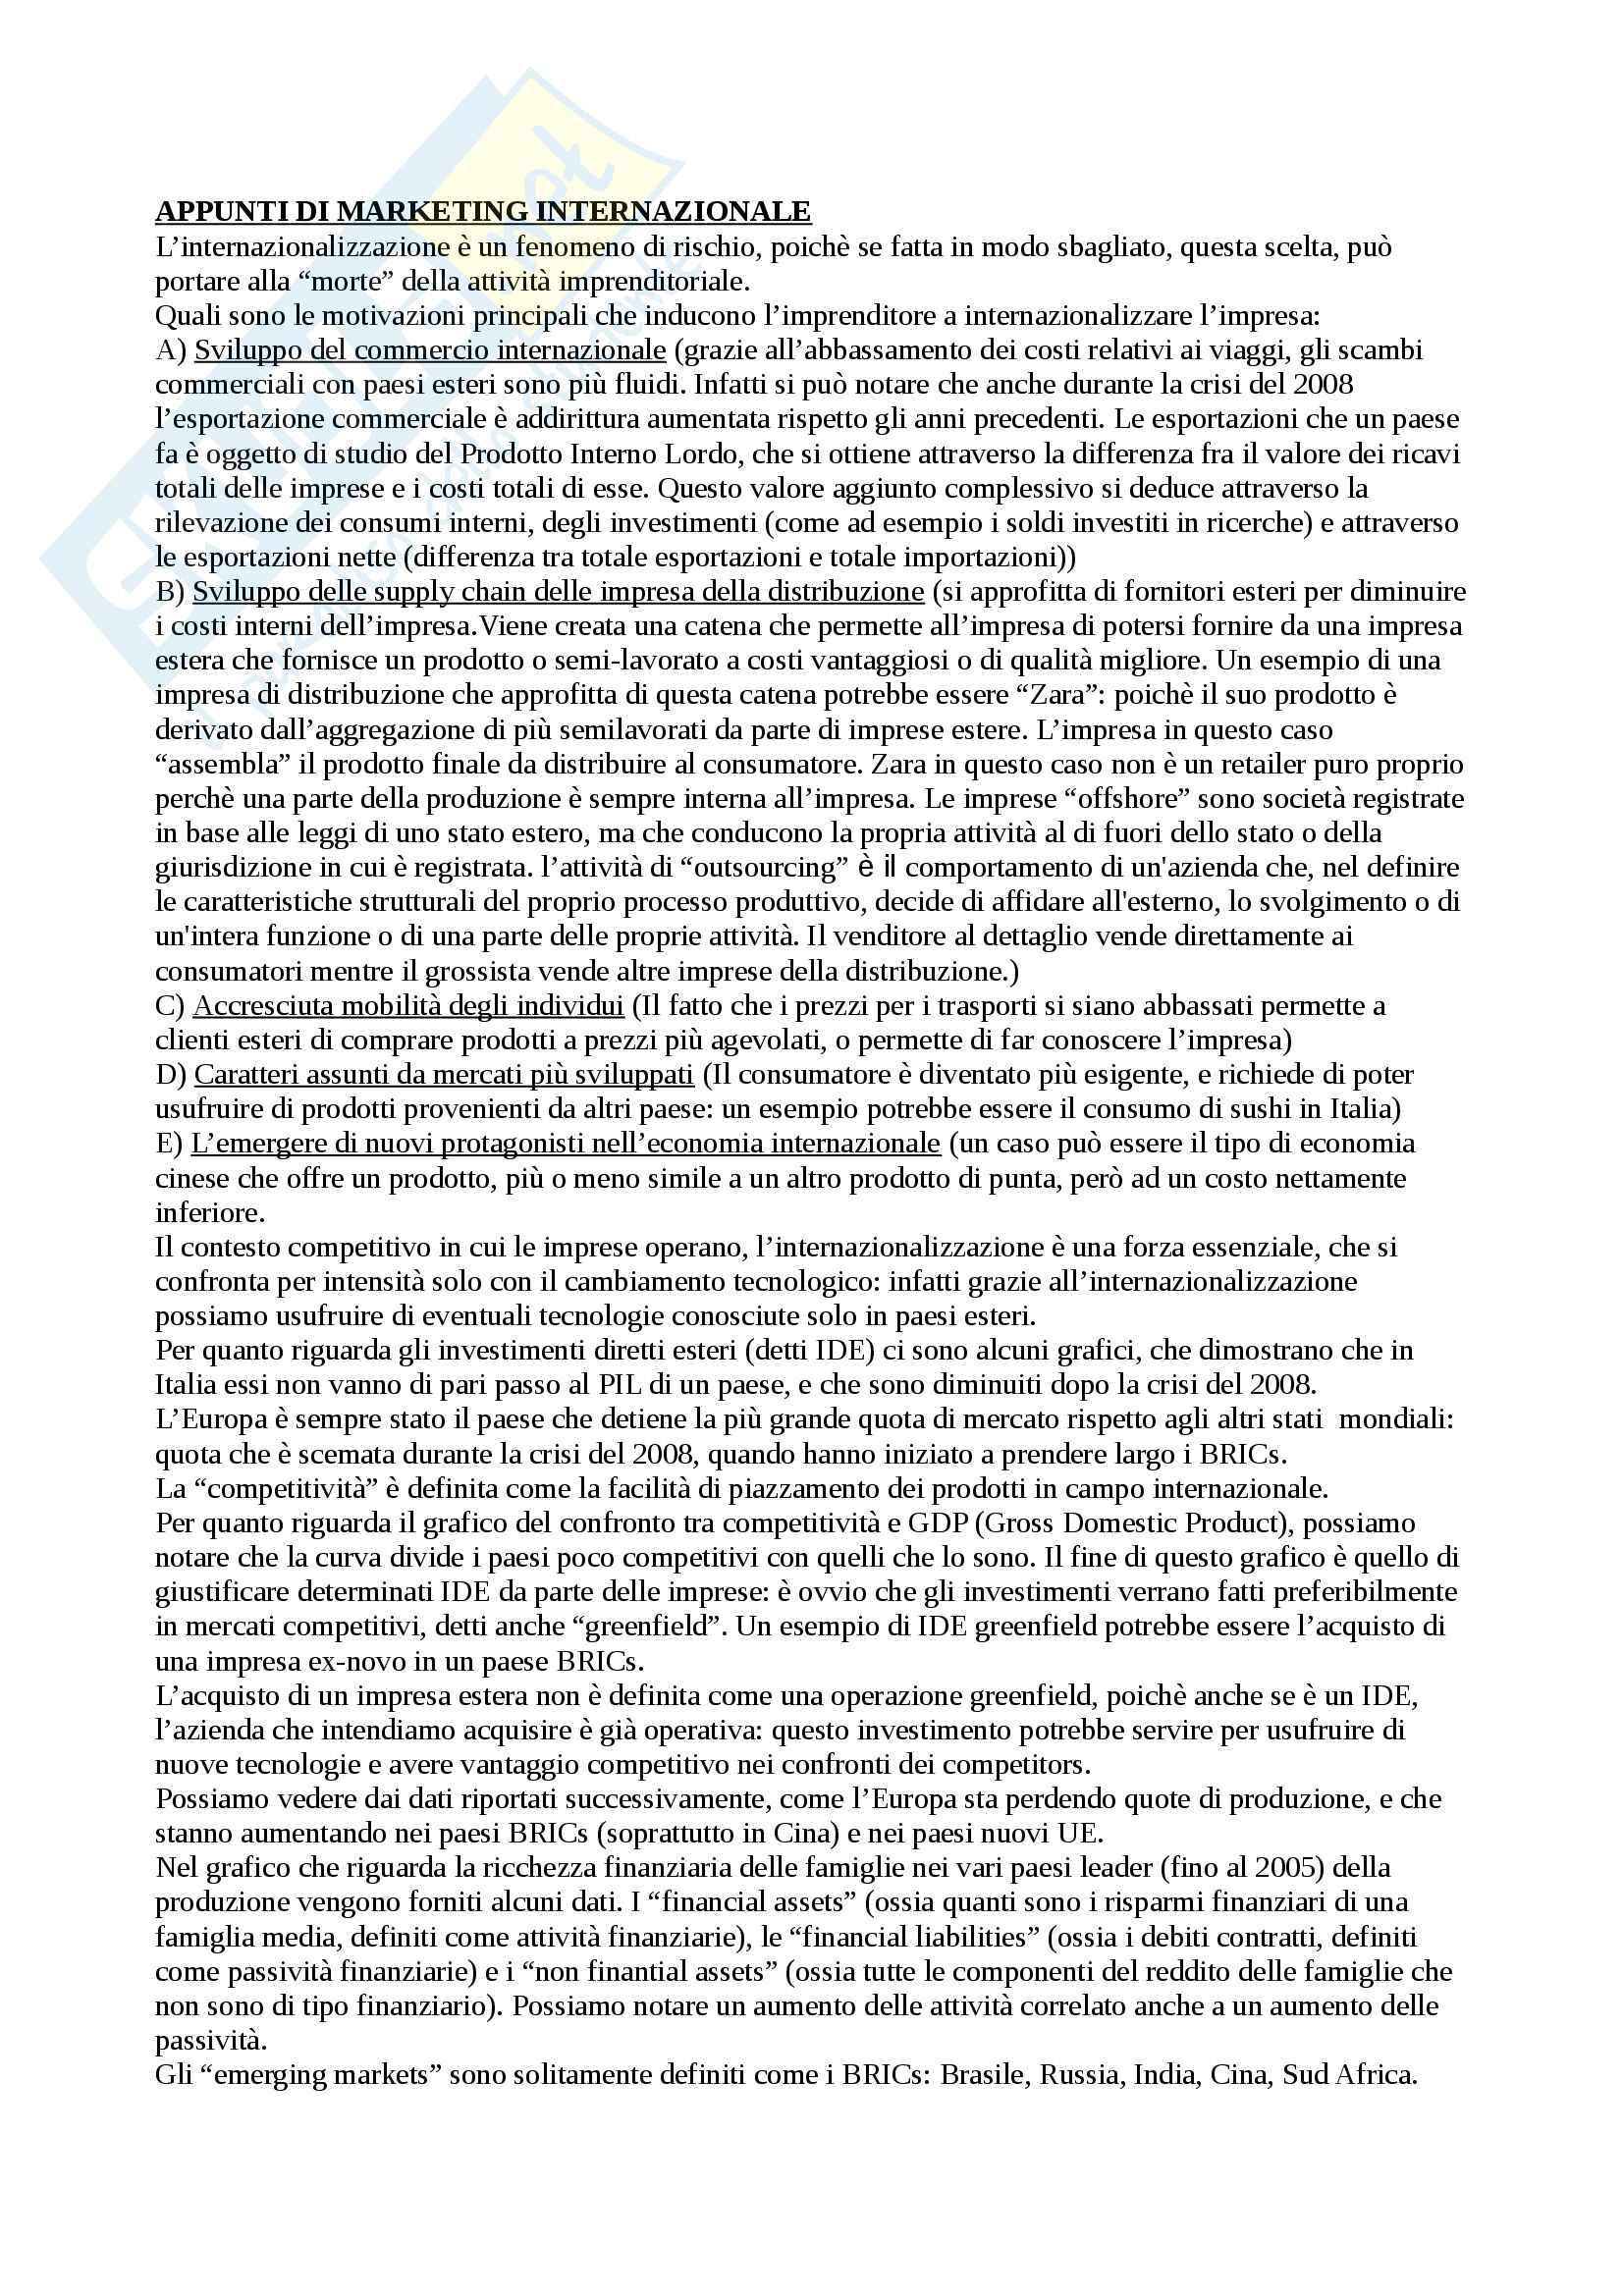 Appunti Esame Intermedio Marketing internazionale